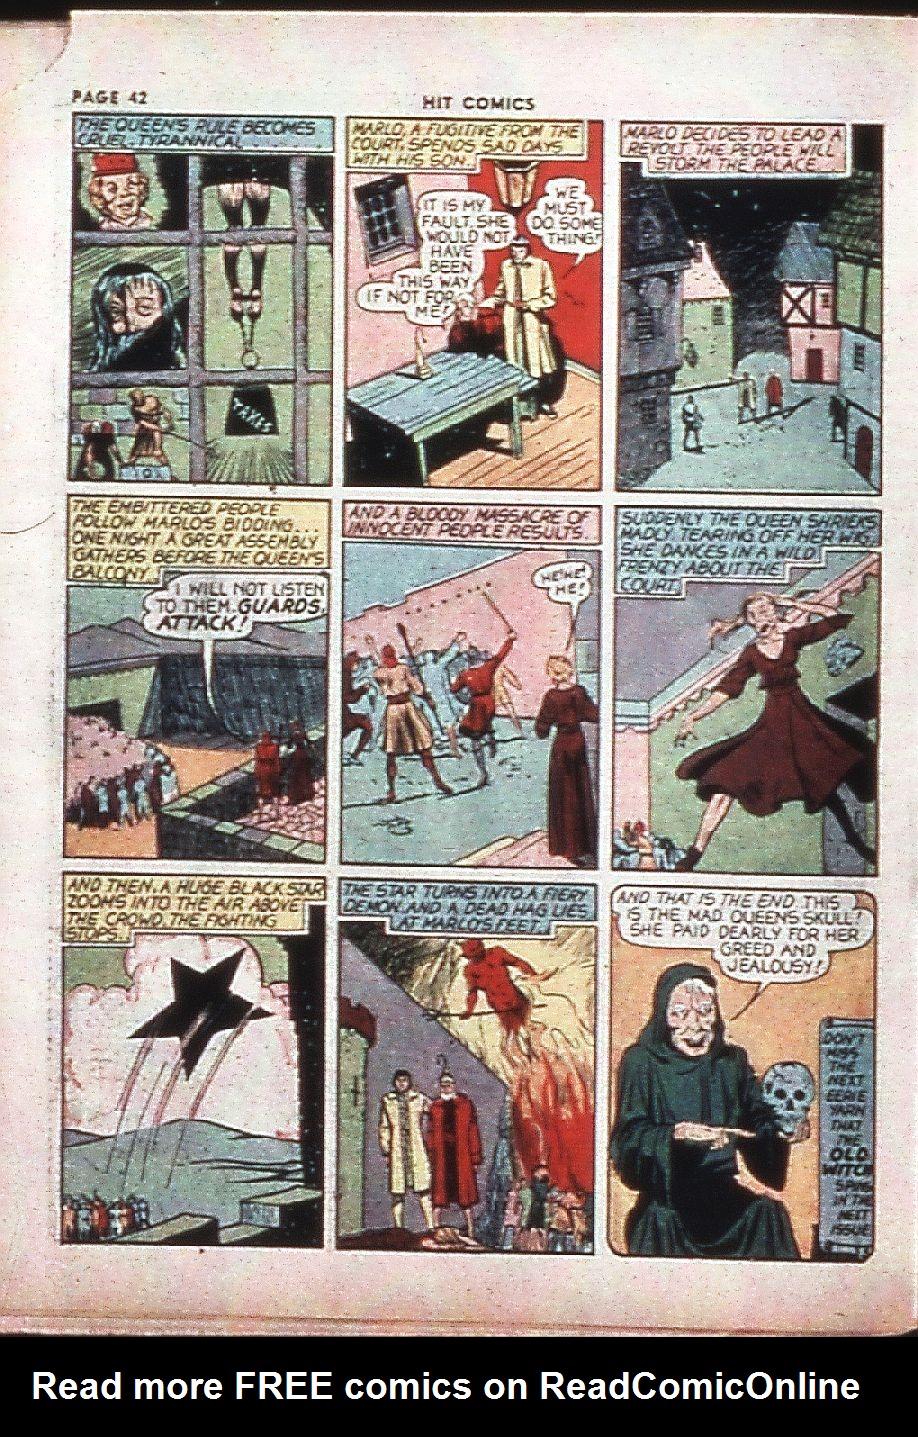 Read online Hit Comics comic -  Issue #4 - 44